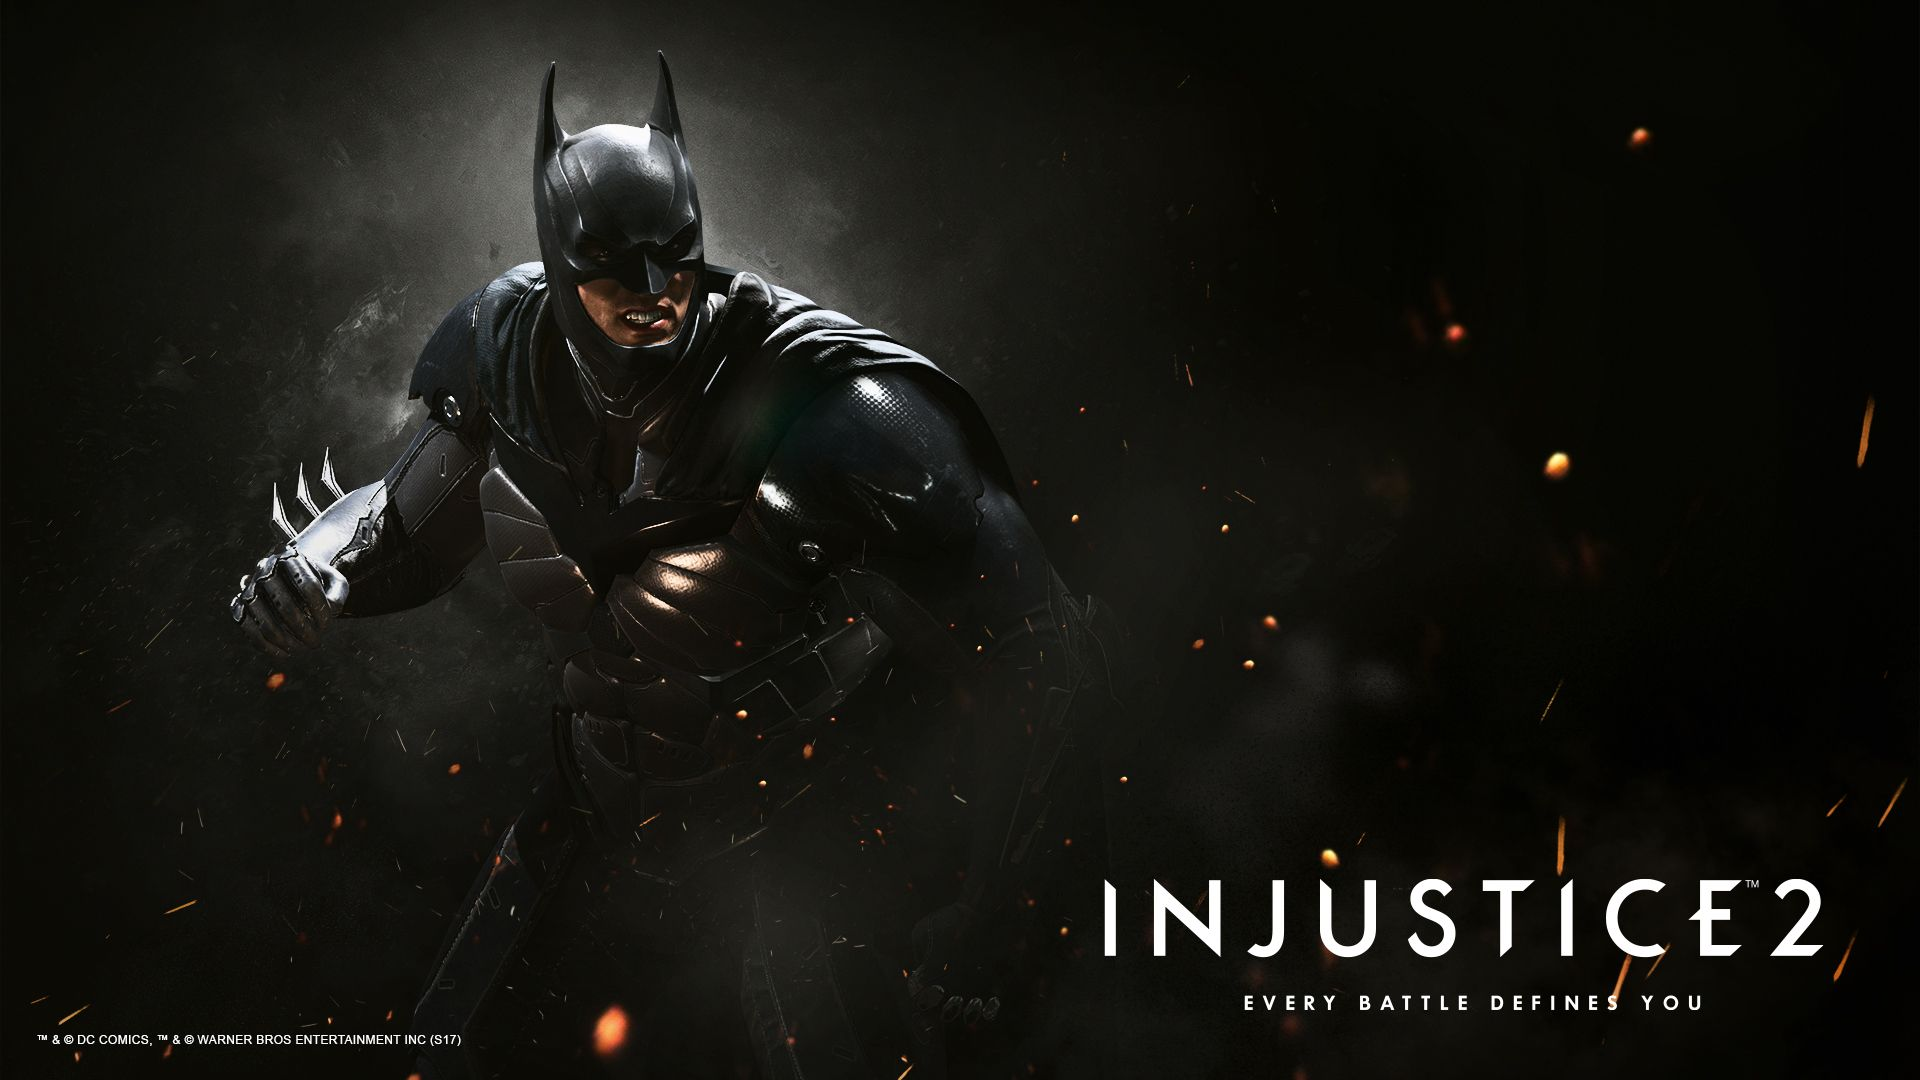 Image injustice2 batman wallpaper 1920x1080 13g injustice injustice2 batman wallpaper 1920x1080 13g voltagebd Images